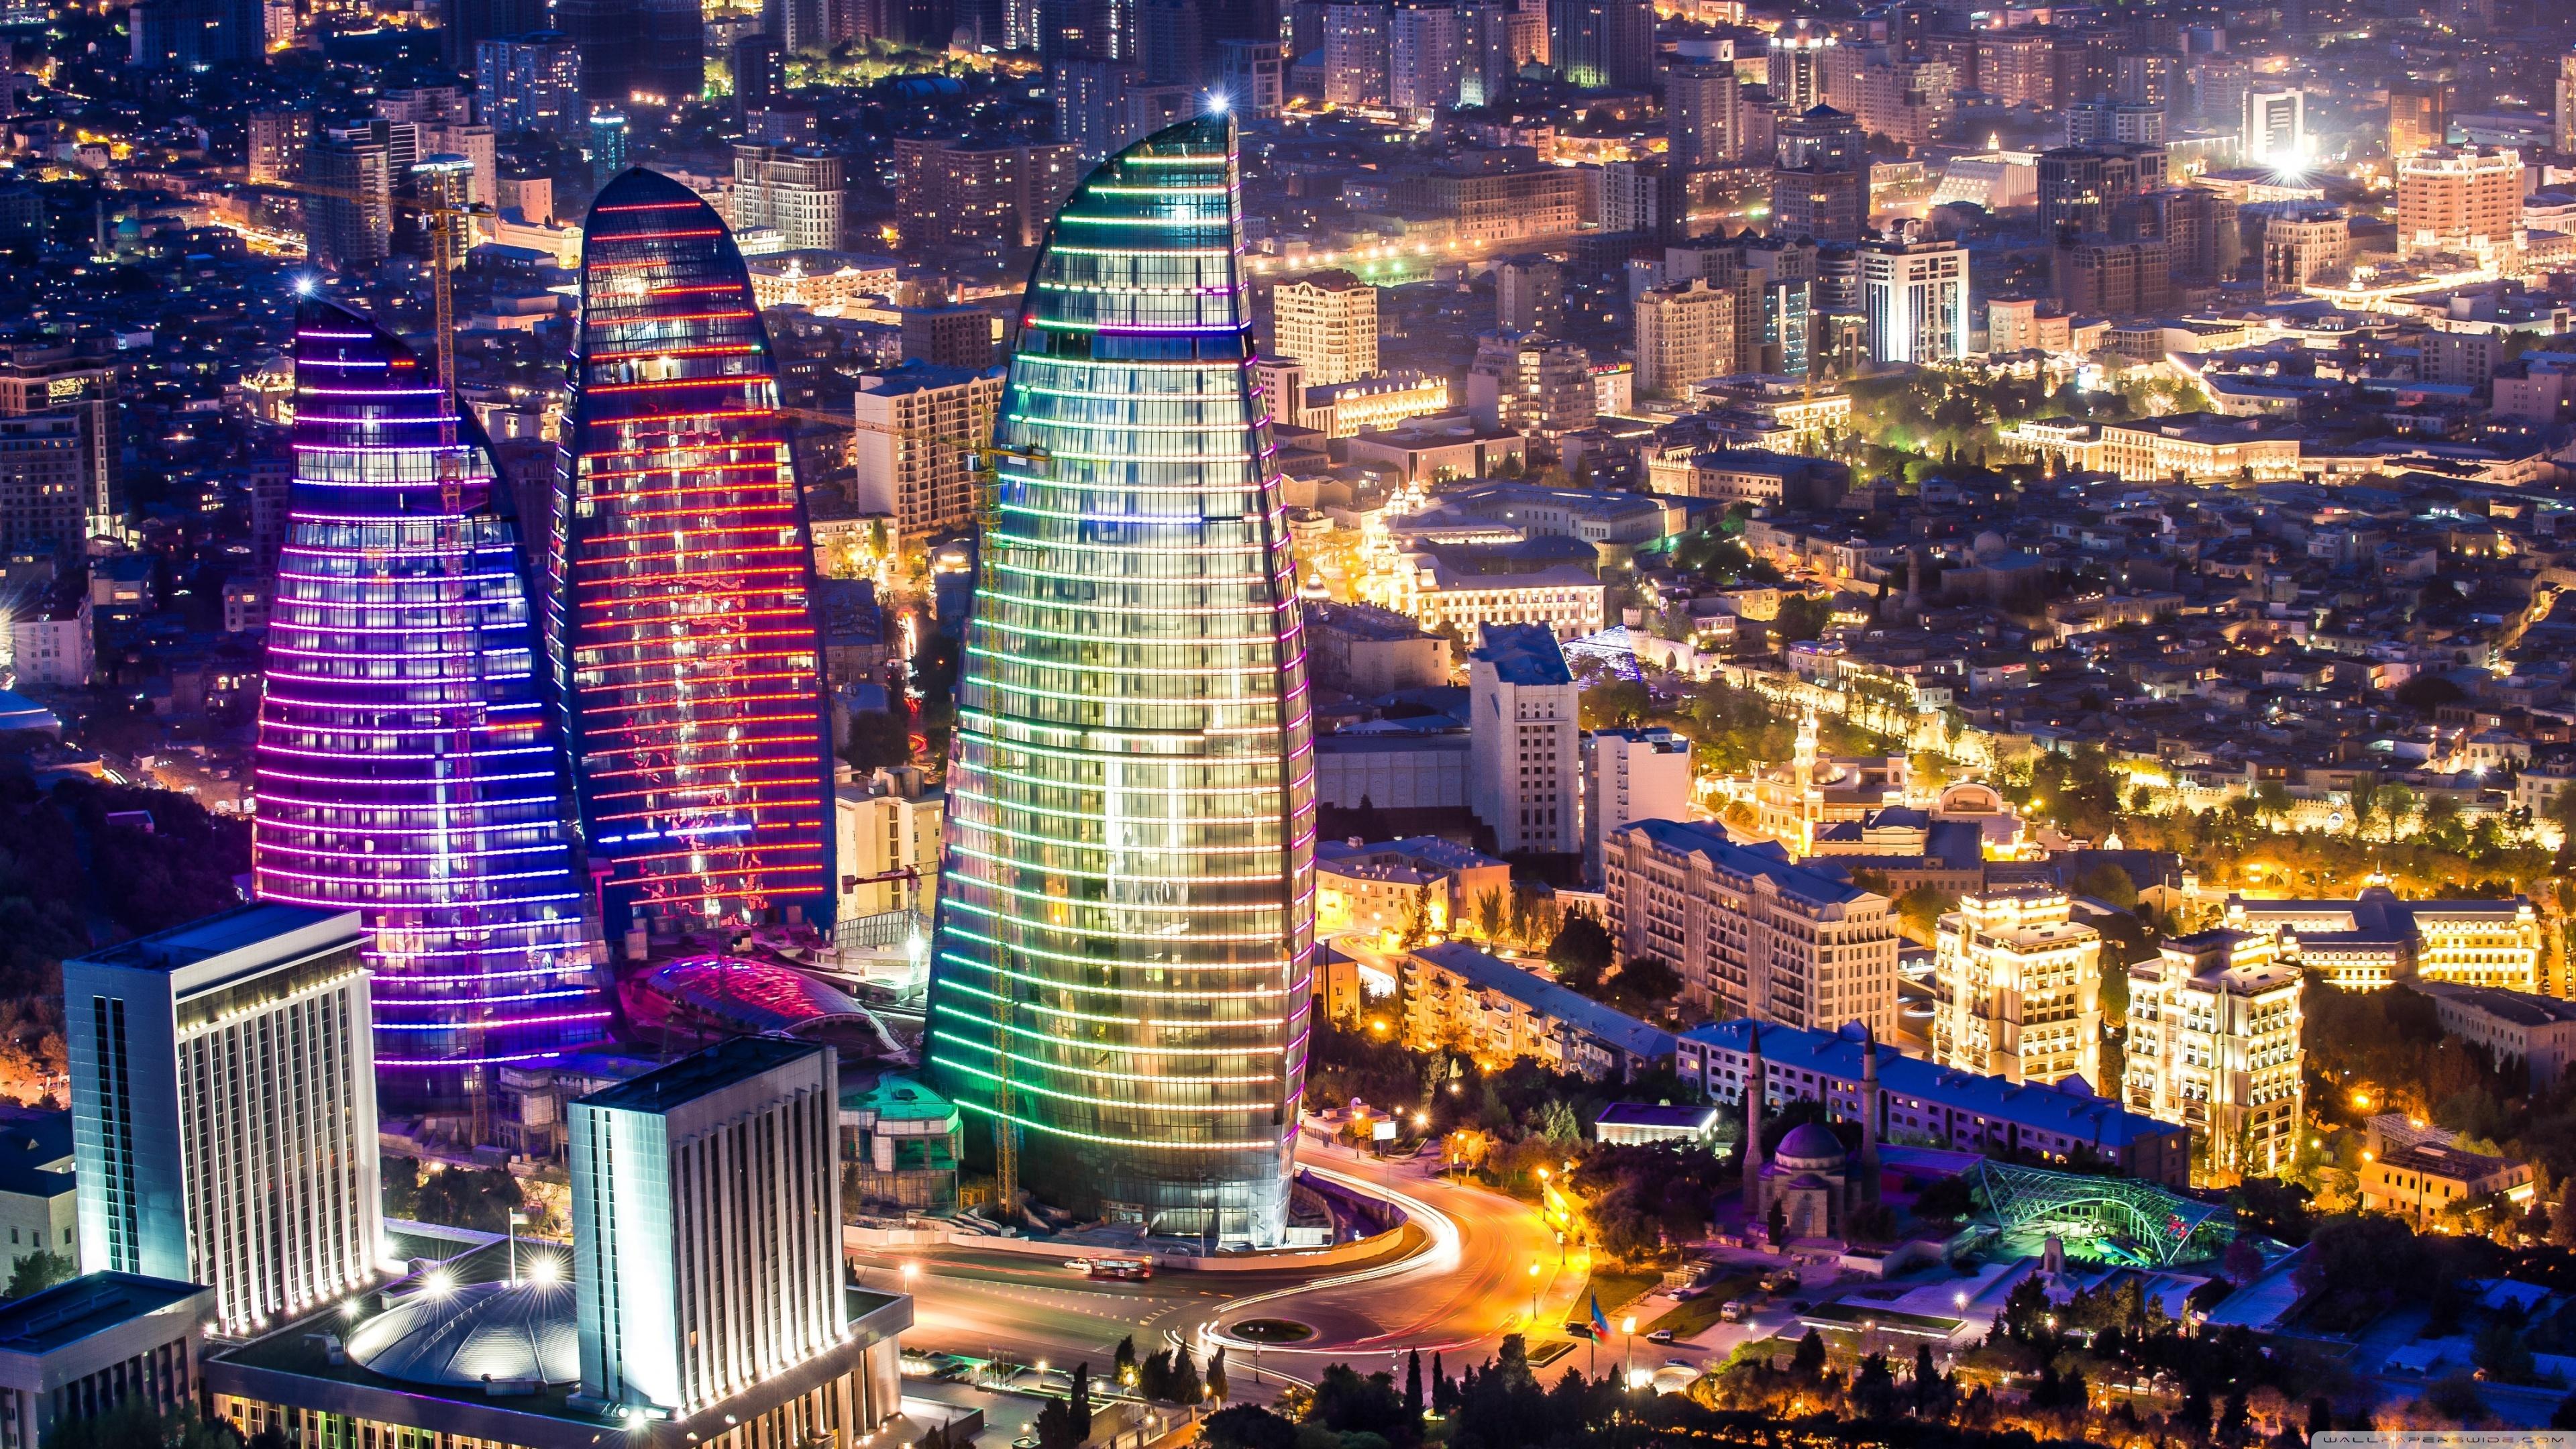 Flame Towers Baku Azerbaijan 4K HD Desktop Wallpaper for 3840x2160